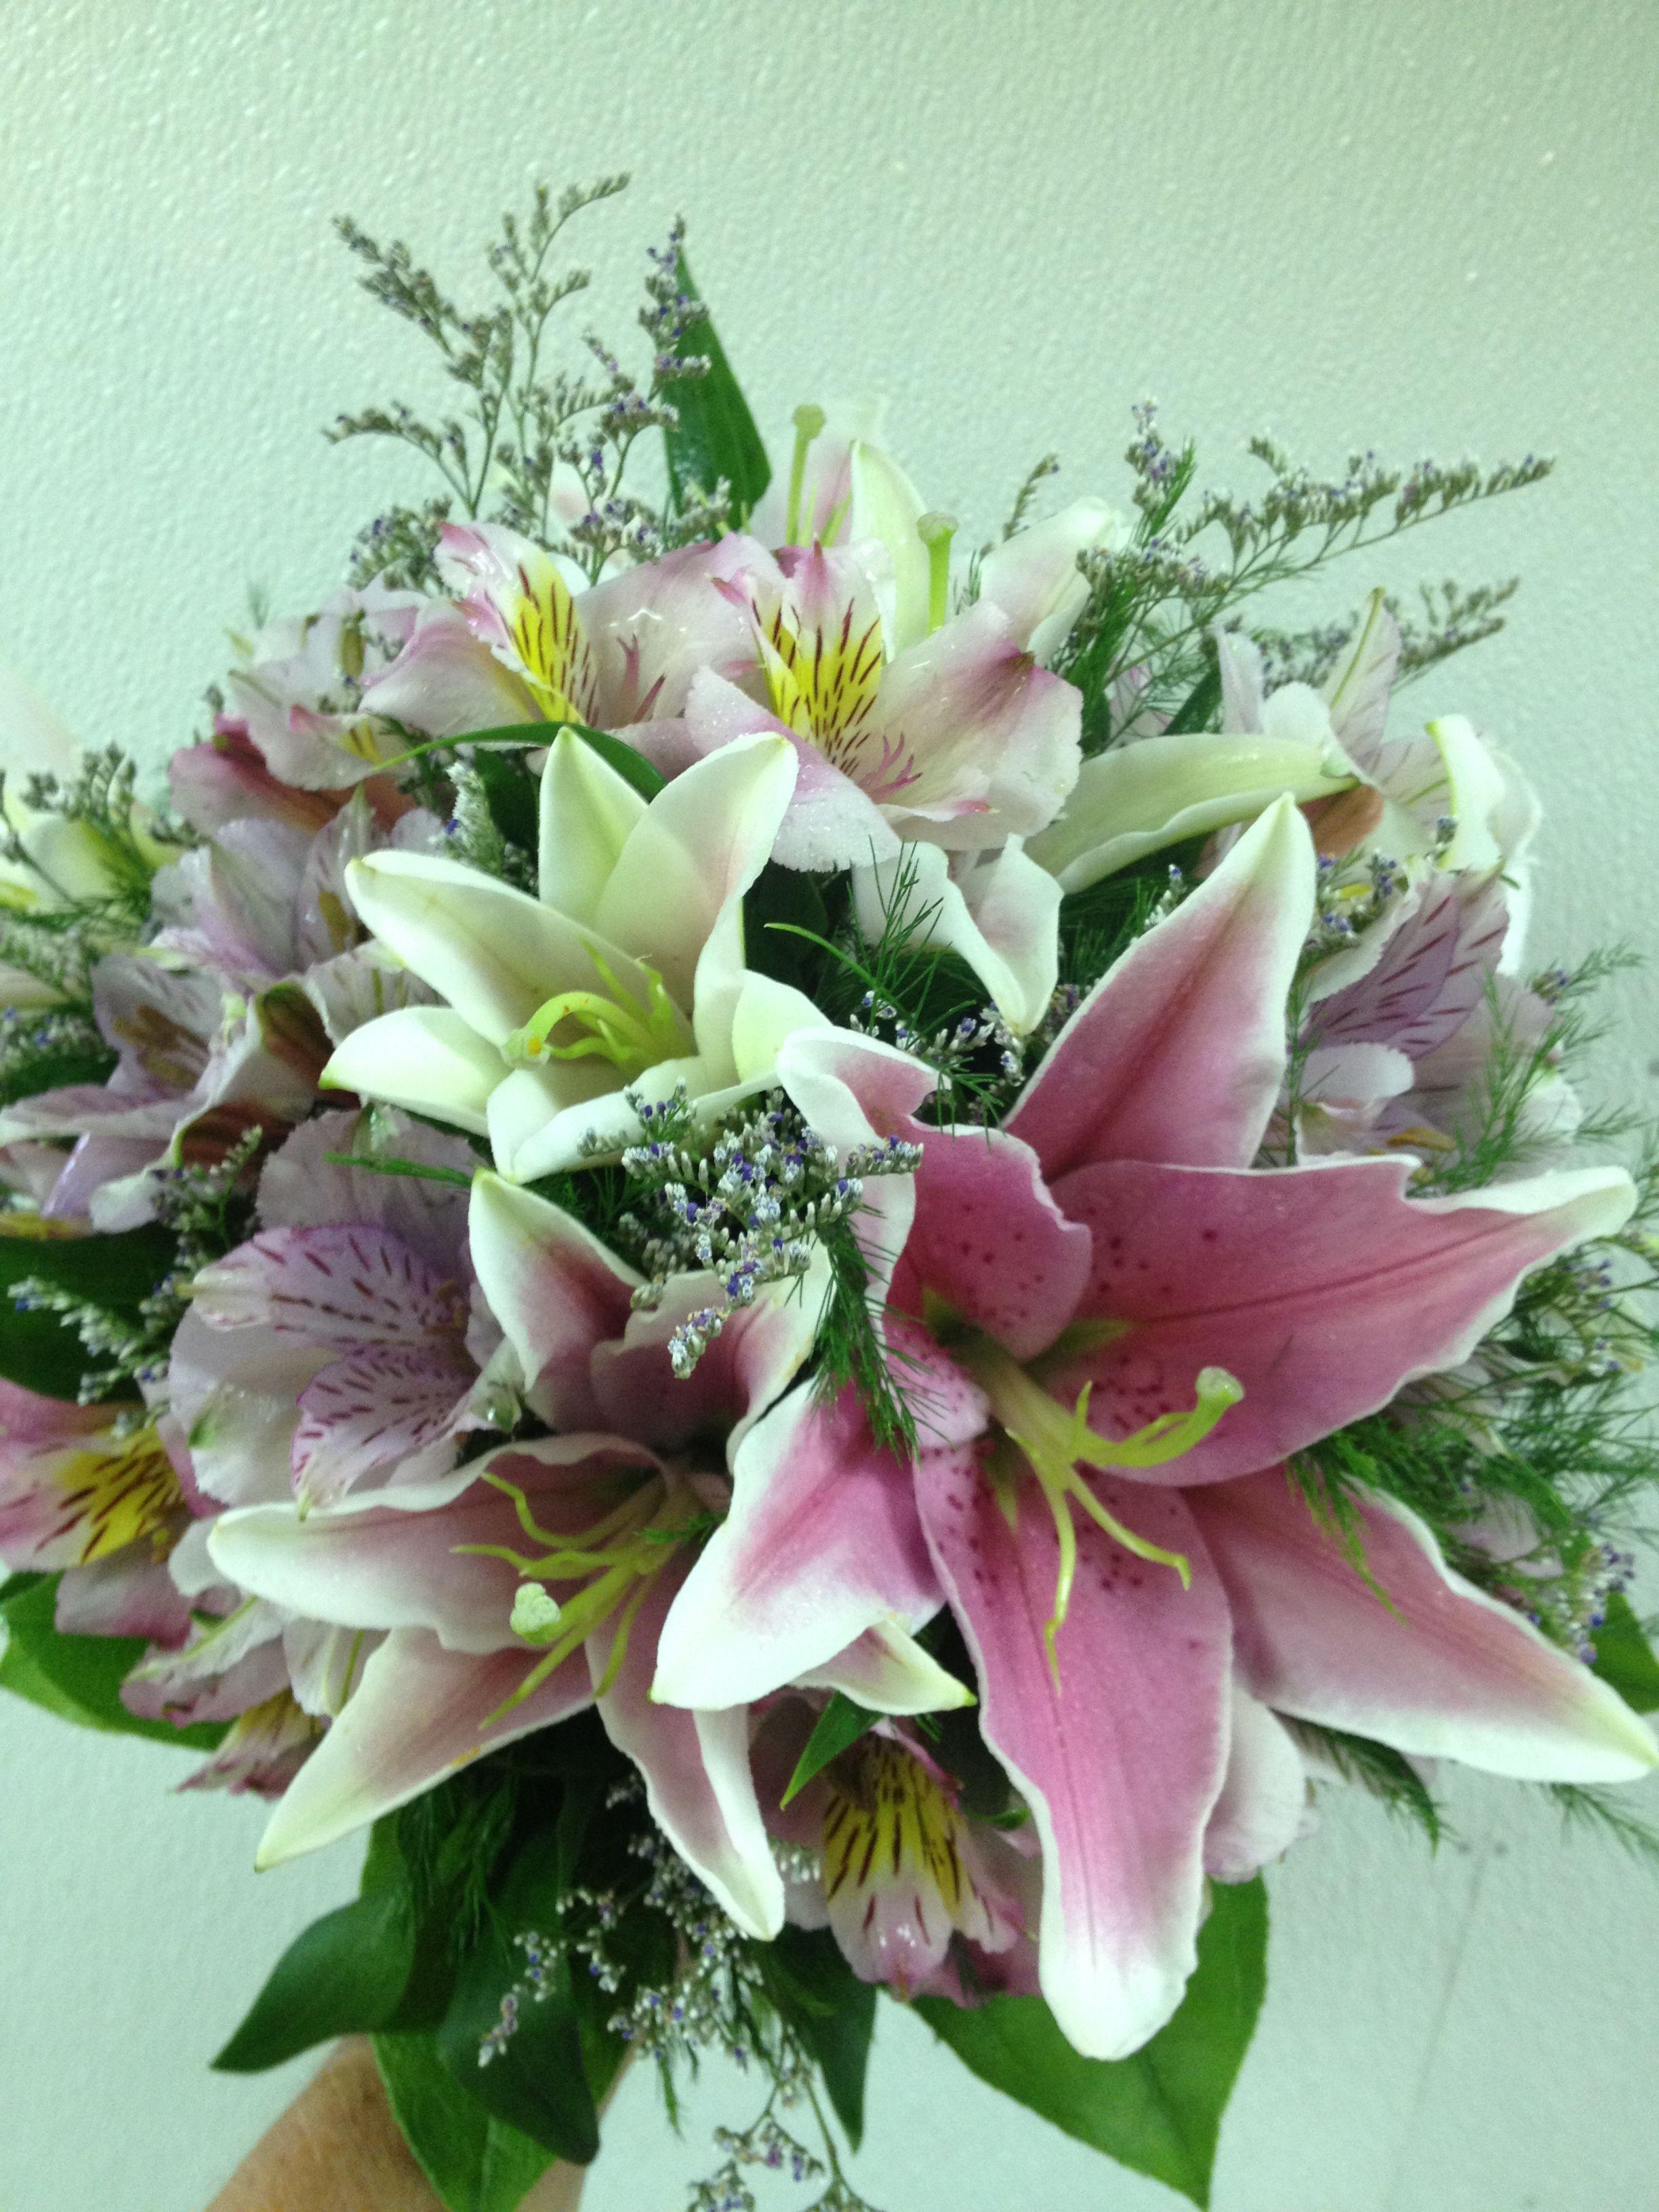 Fragrant Stargazer lillies